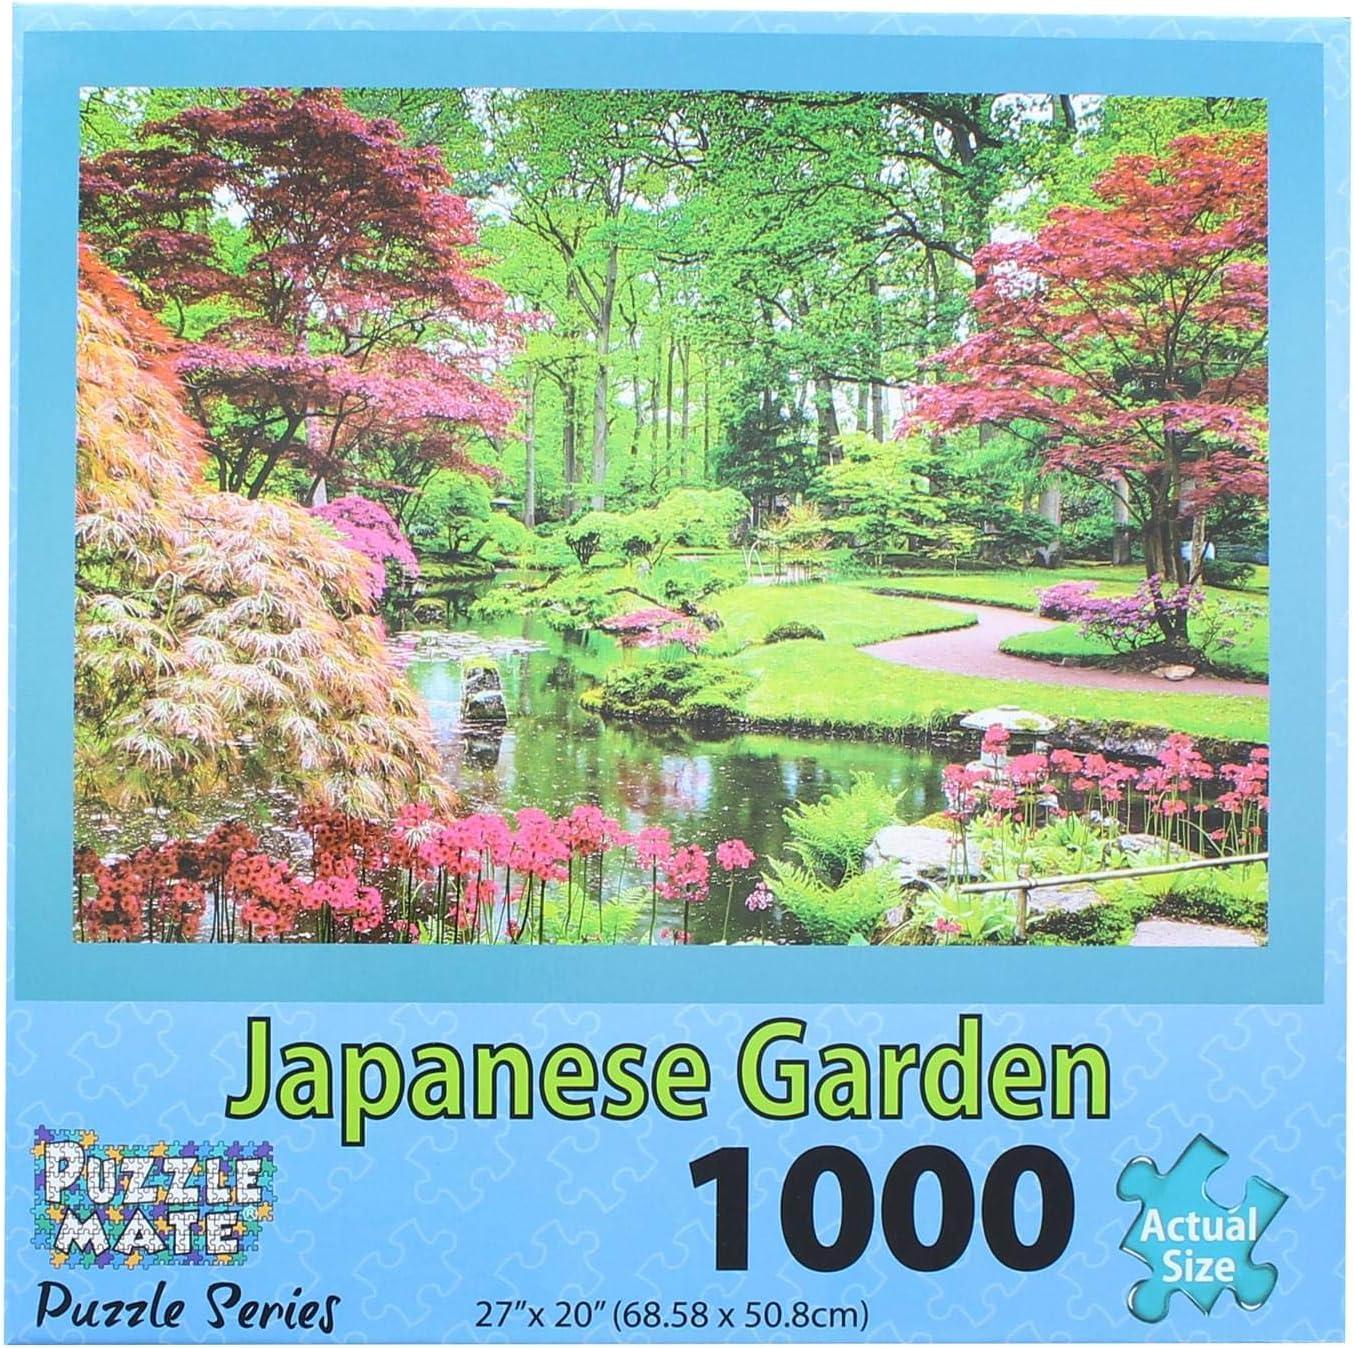 Puzzle Mate - Japanese Garden - 1000 Piece Jigsaw Puzzle